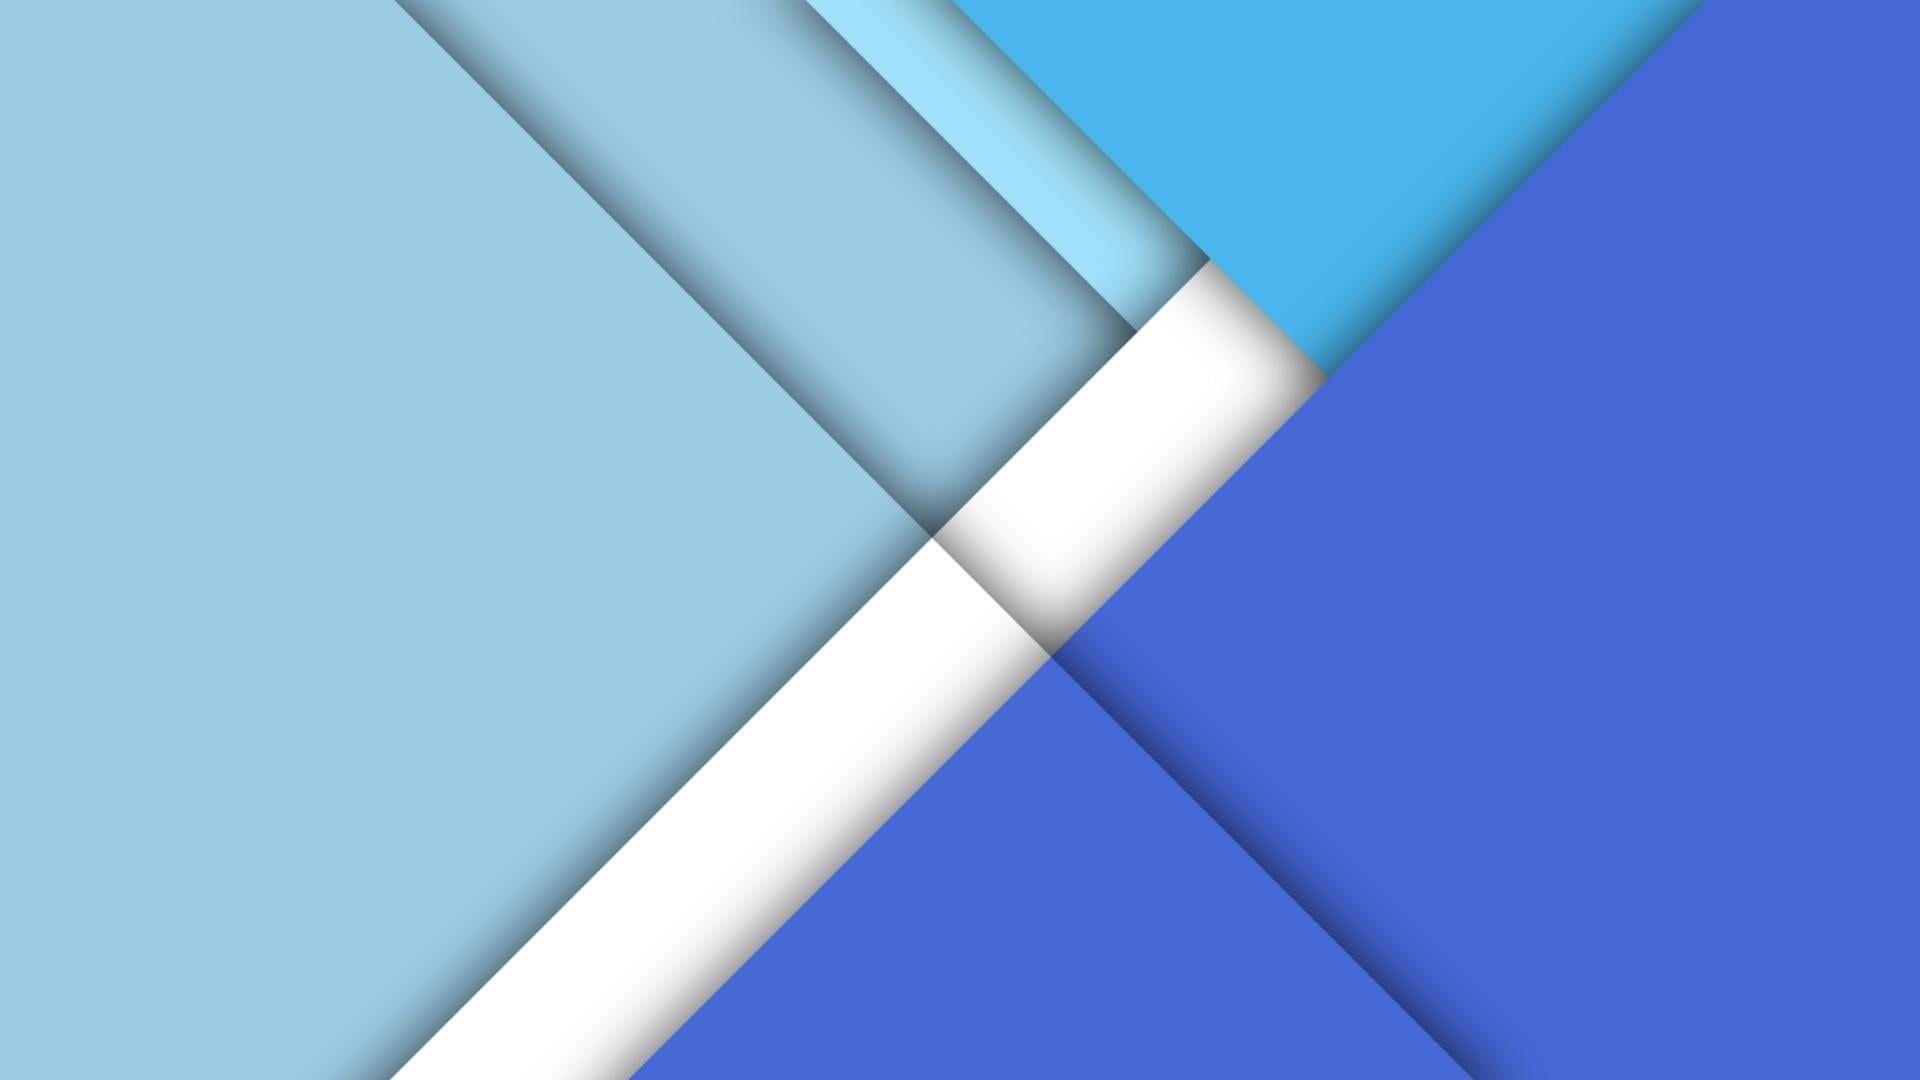 Blue White Material Design Minimal Art Material Minimalist 1080p Wallpaper Hdwallpaper De In 2020 Abstract Wallpaper Blue Wallpapers Blue Background Wallpapers